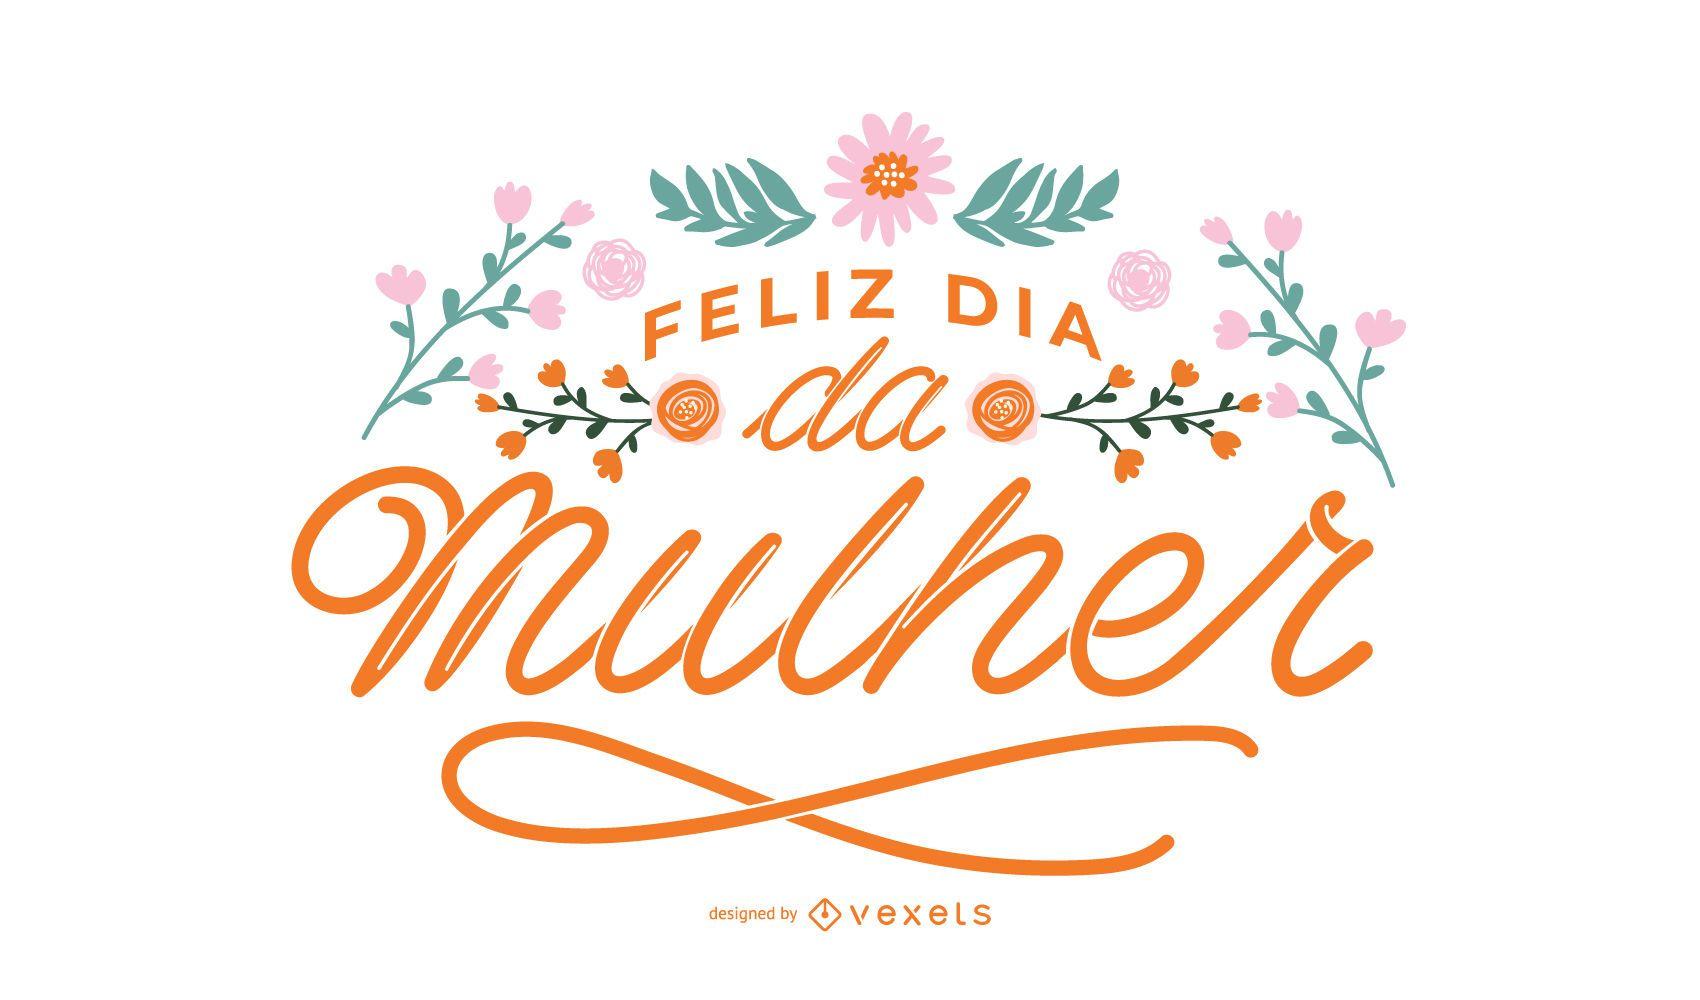 Happy women's day portuguese lettering